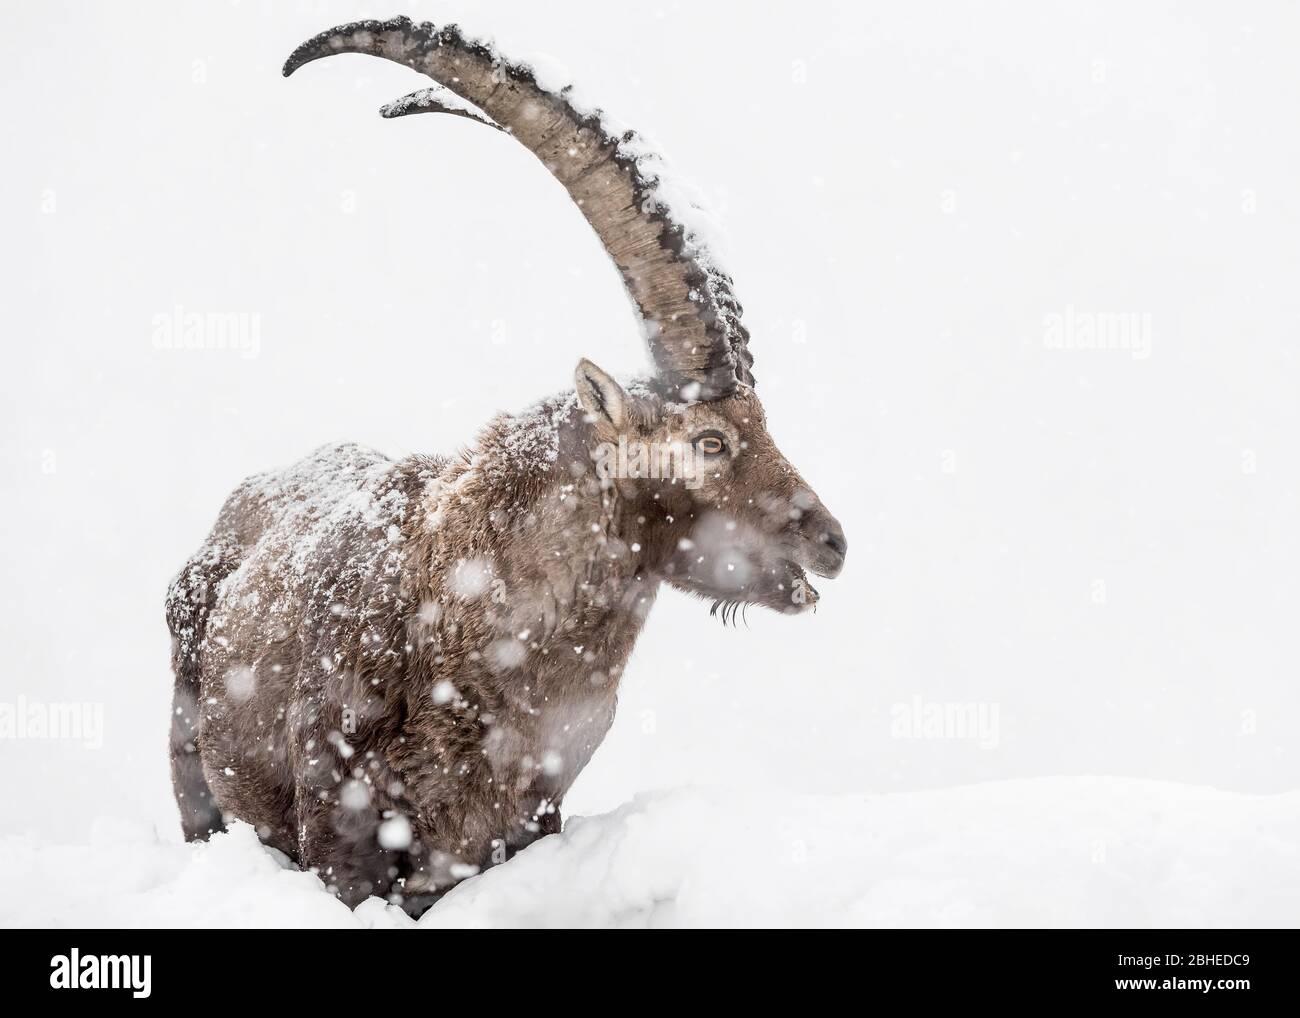 Call of the wild, portrait of Alpine ibex under snowstorm (Capra ibex) Stock Photo